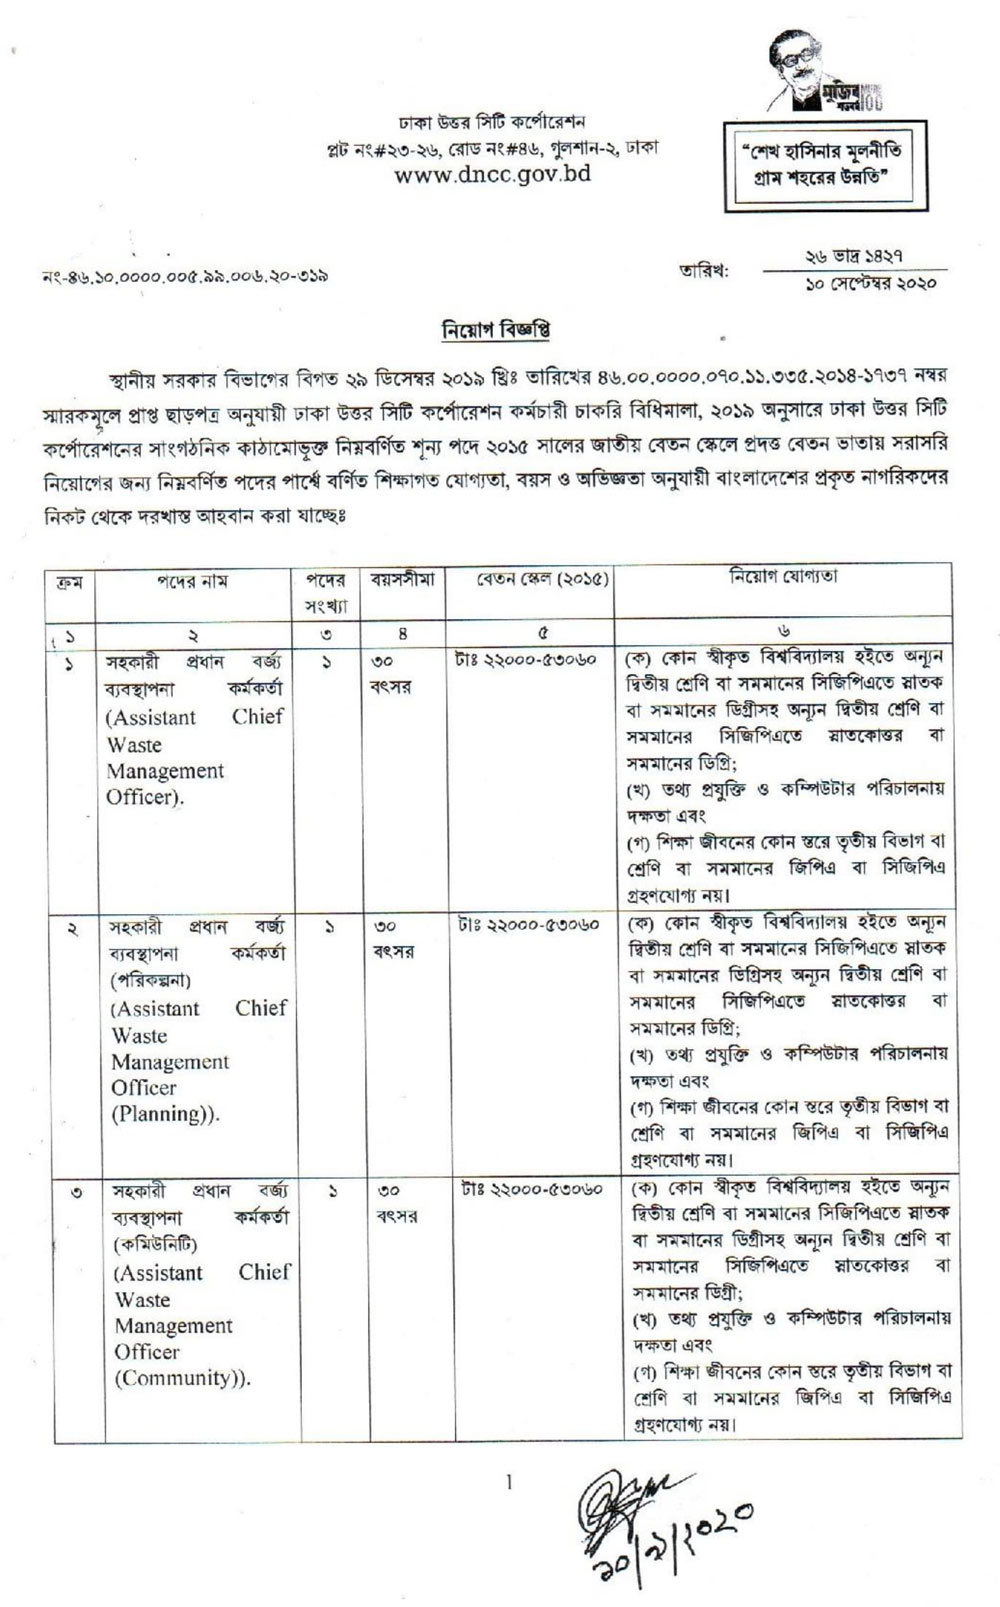 DNCC Teletalk BD 2020 - dncc.teletalk.com.bd